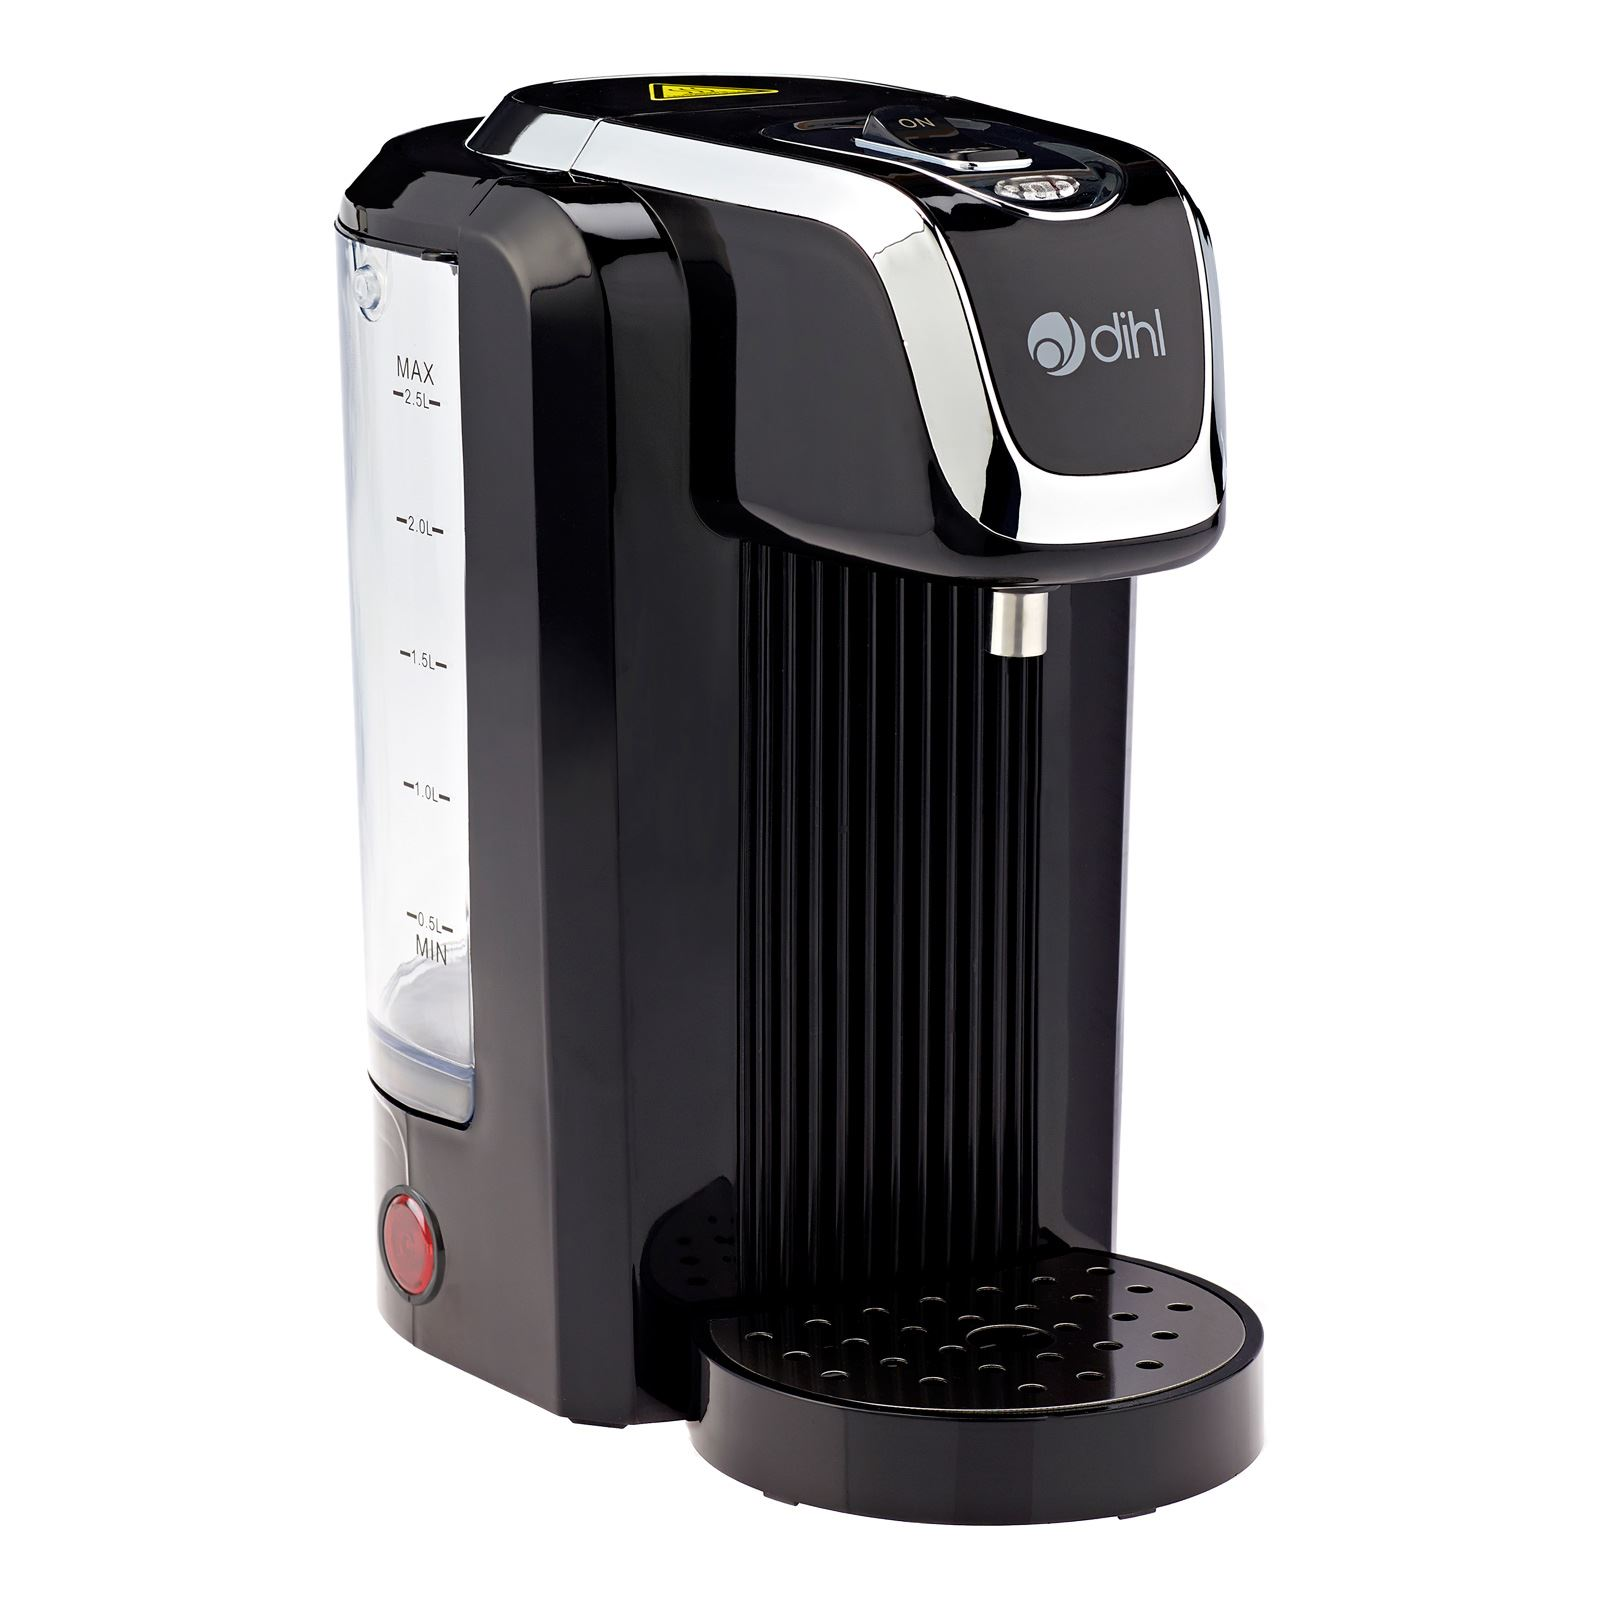 Instant Hot Water Makers : Dihl cream red black instant hot water boiler dispenser